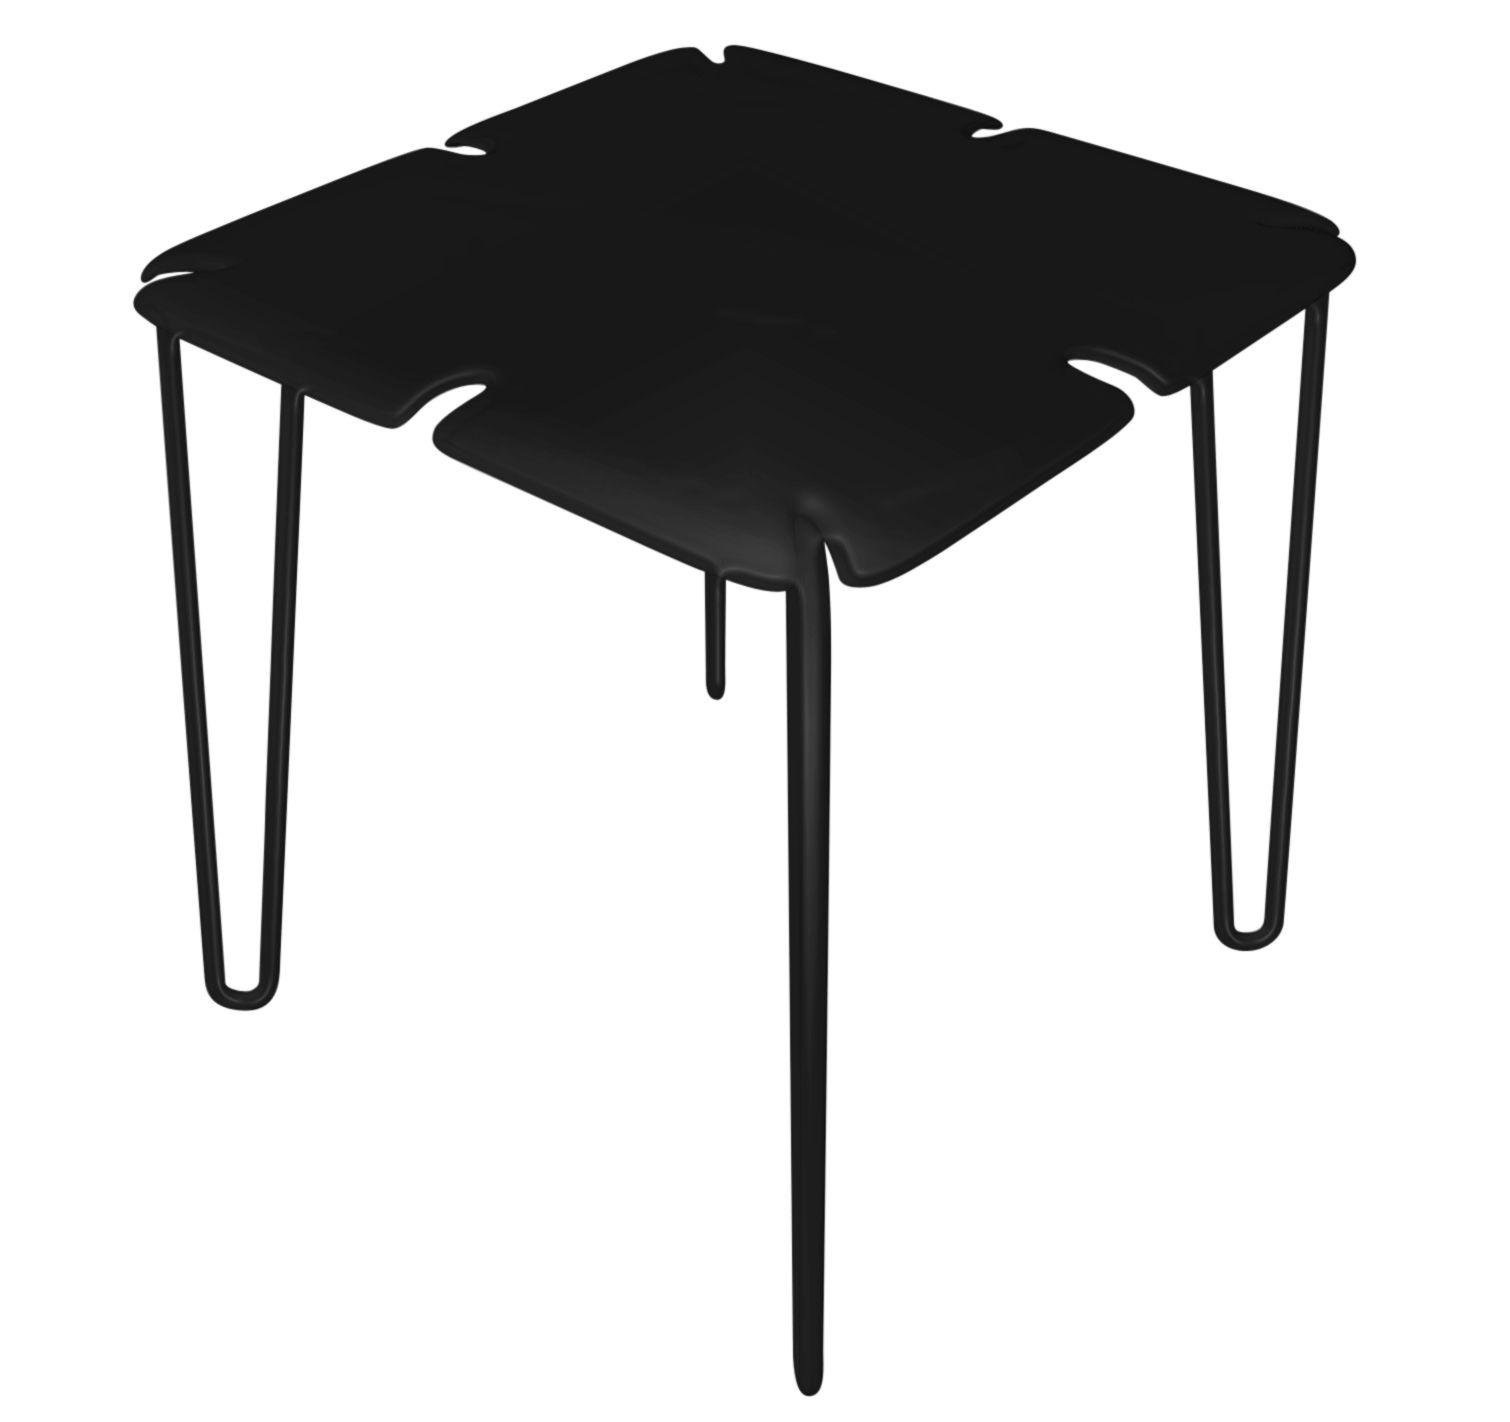 Table chips 78 x 78 cm noir hpl myyour for Alessi porte listino prezzi